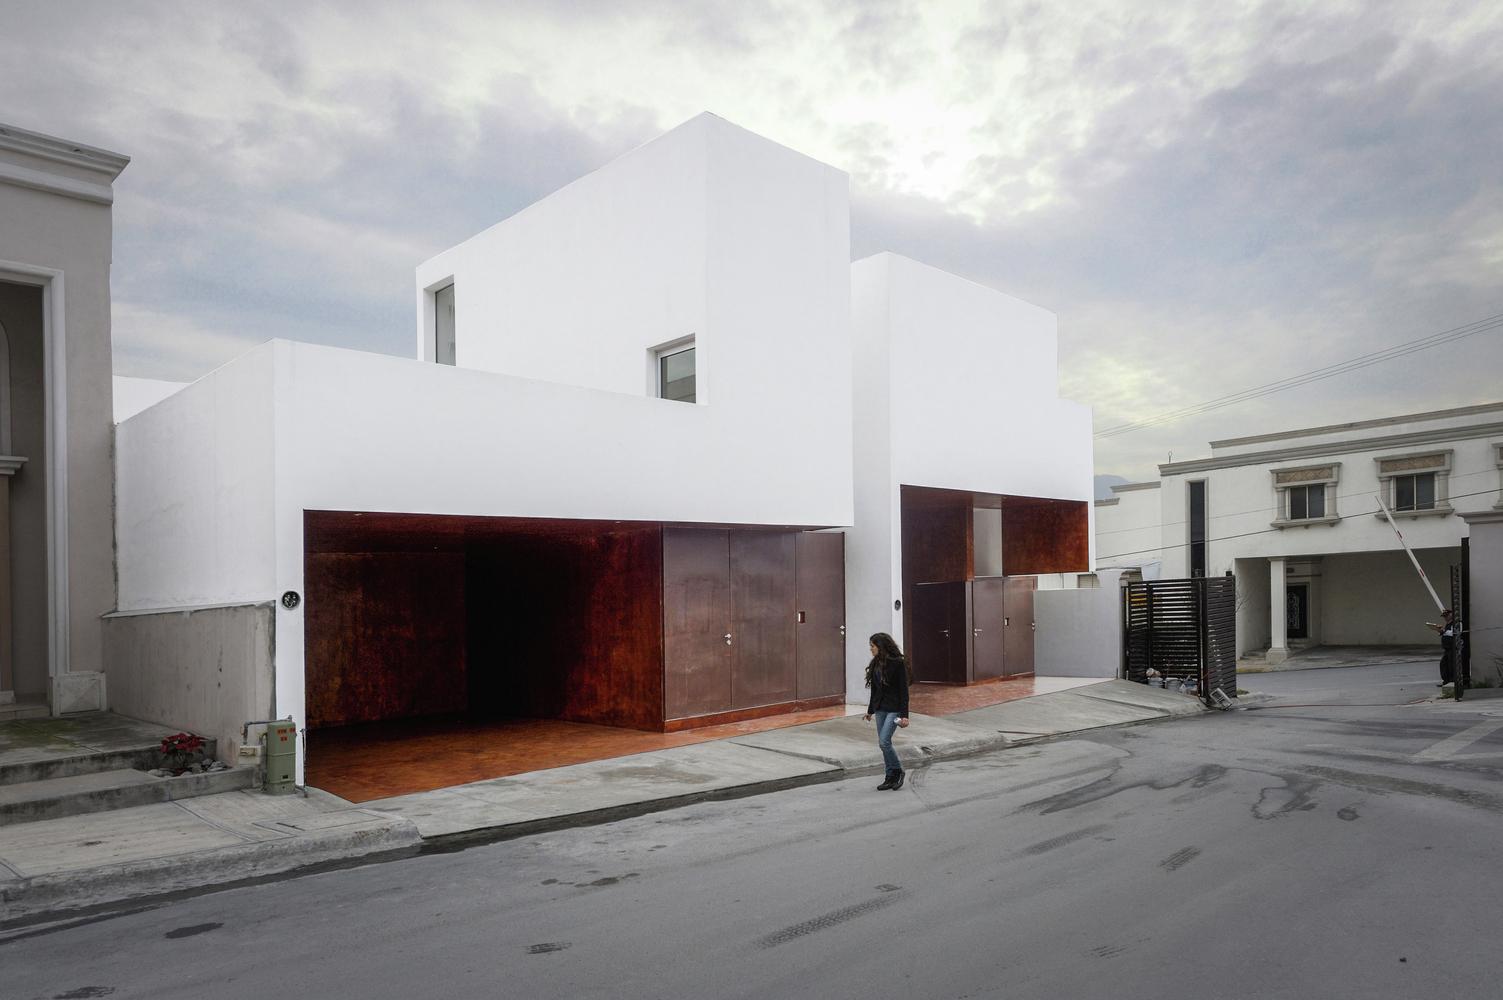 Arquitectura mexicana que rompe moldes